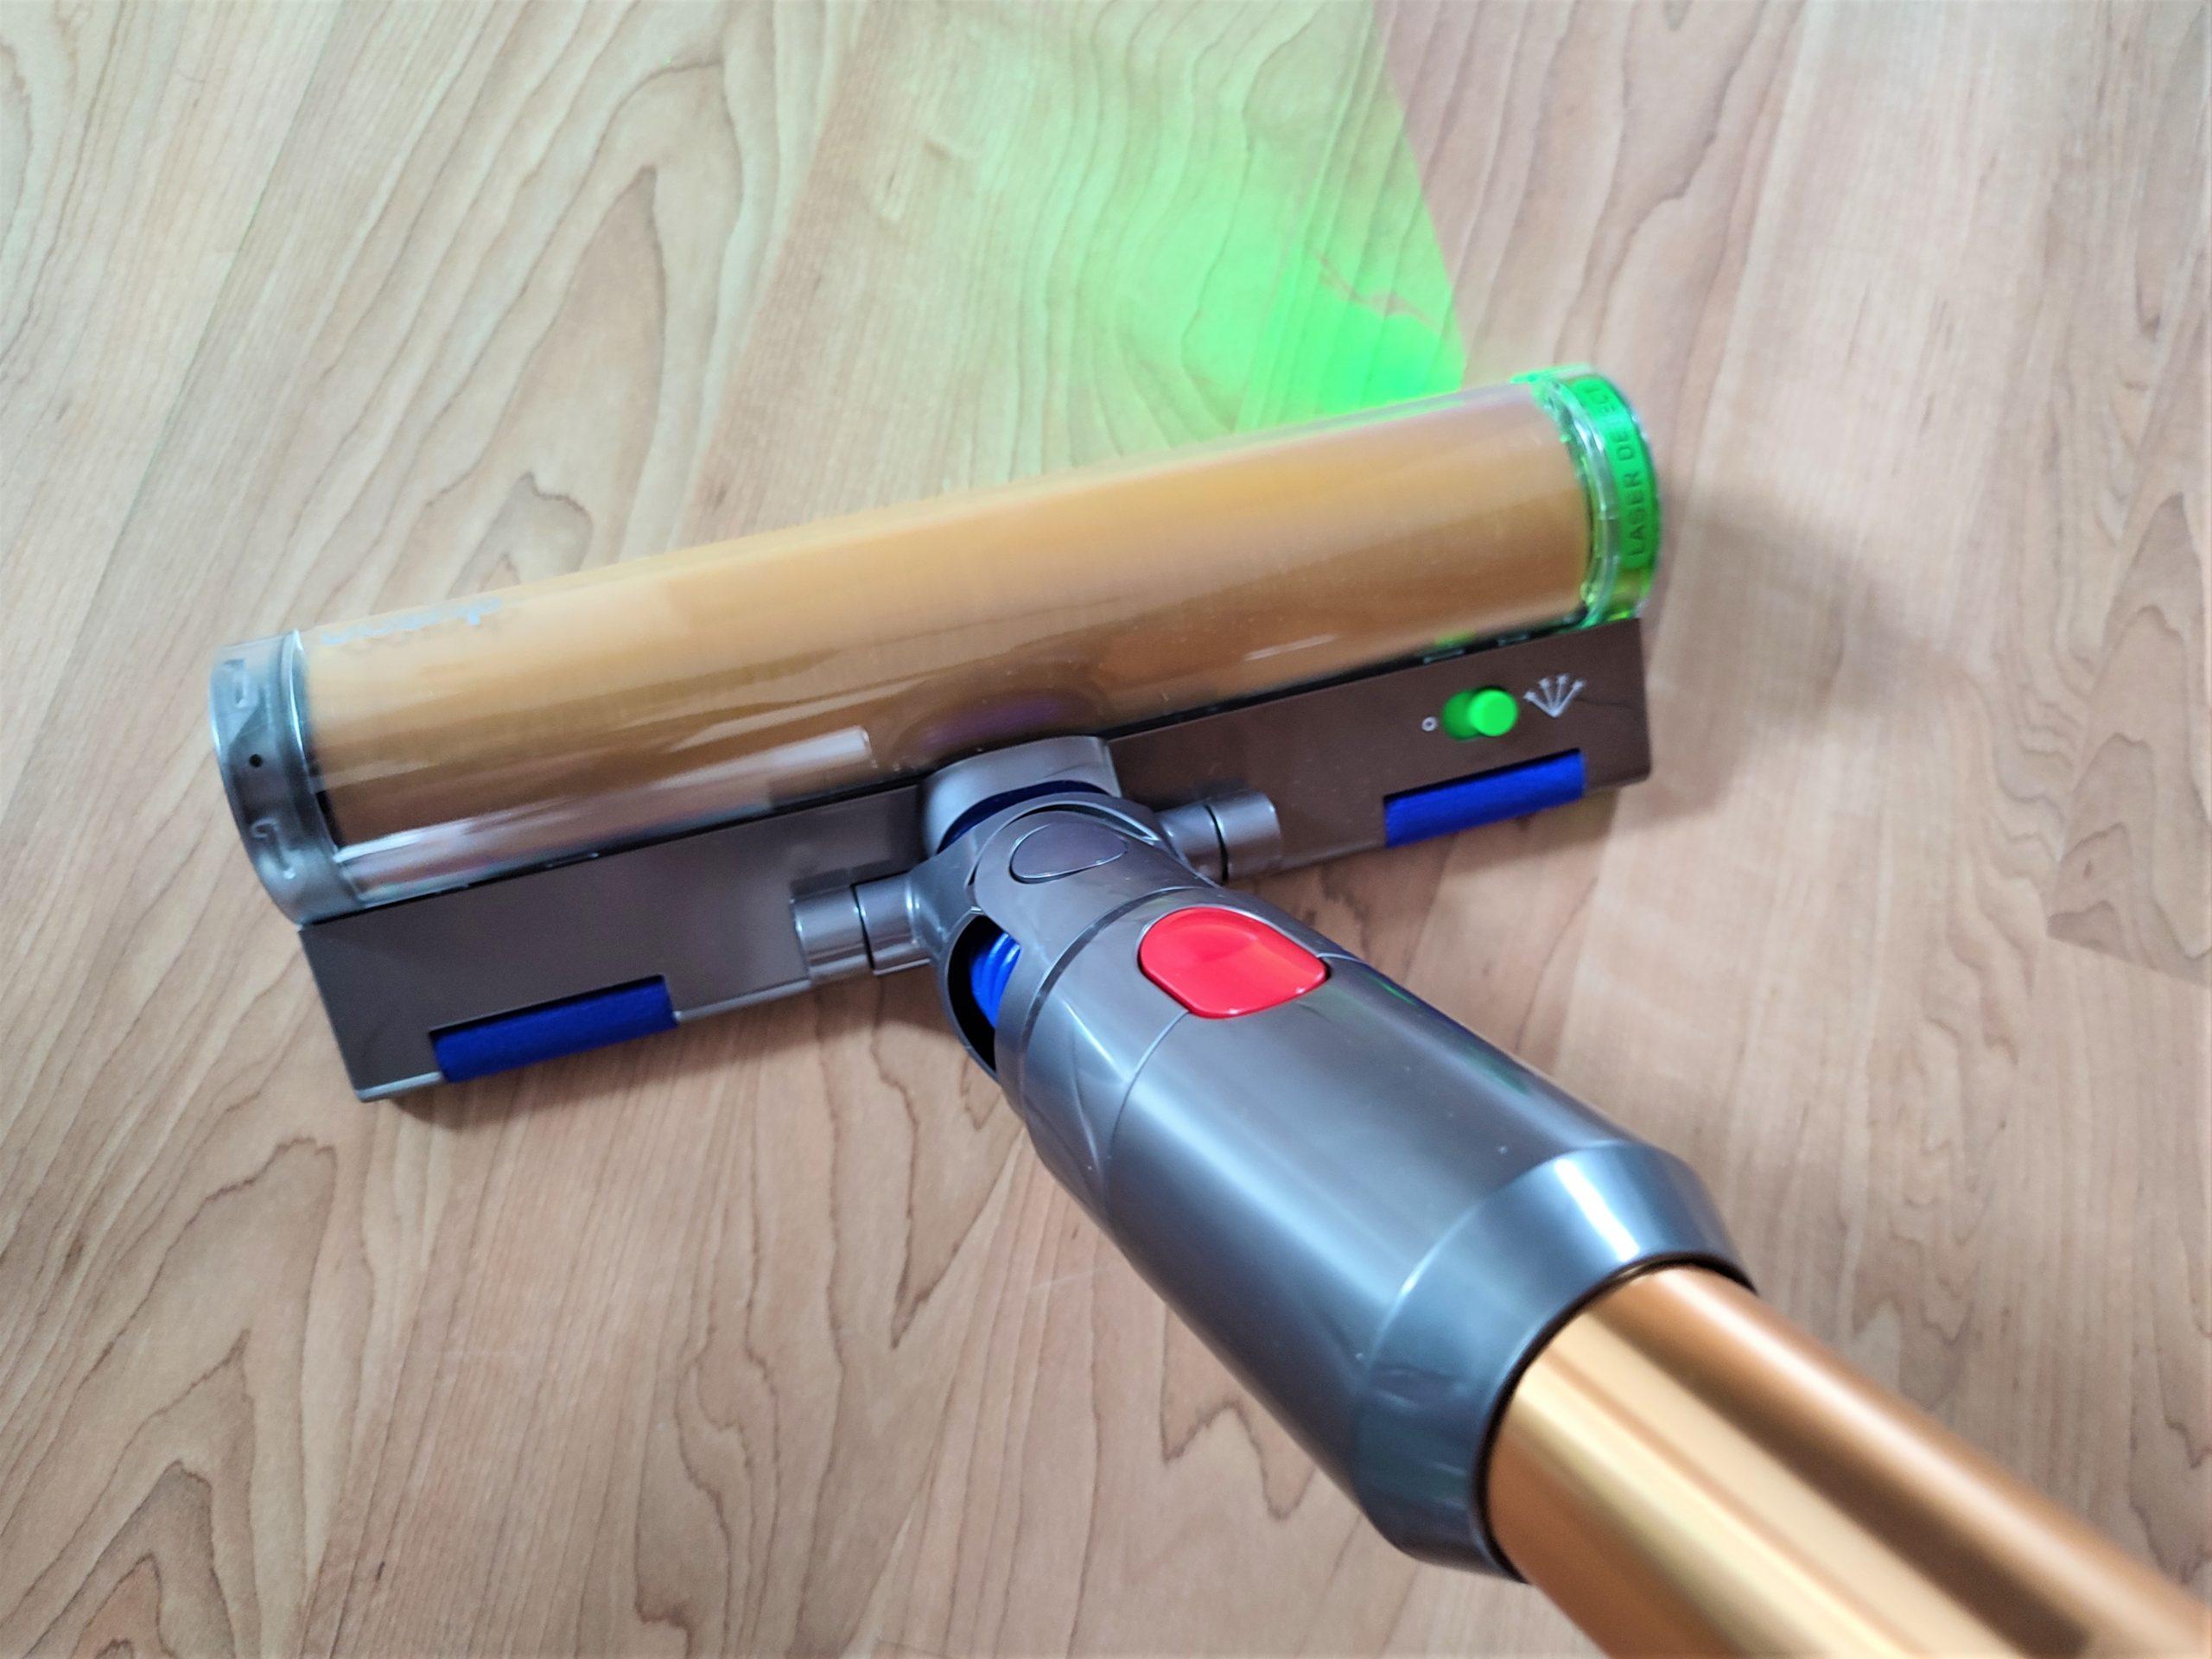 Dyson V15 Detect Akkusauger Bodenduese mit Laser Licht